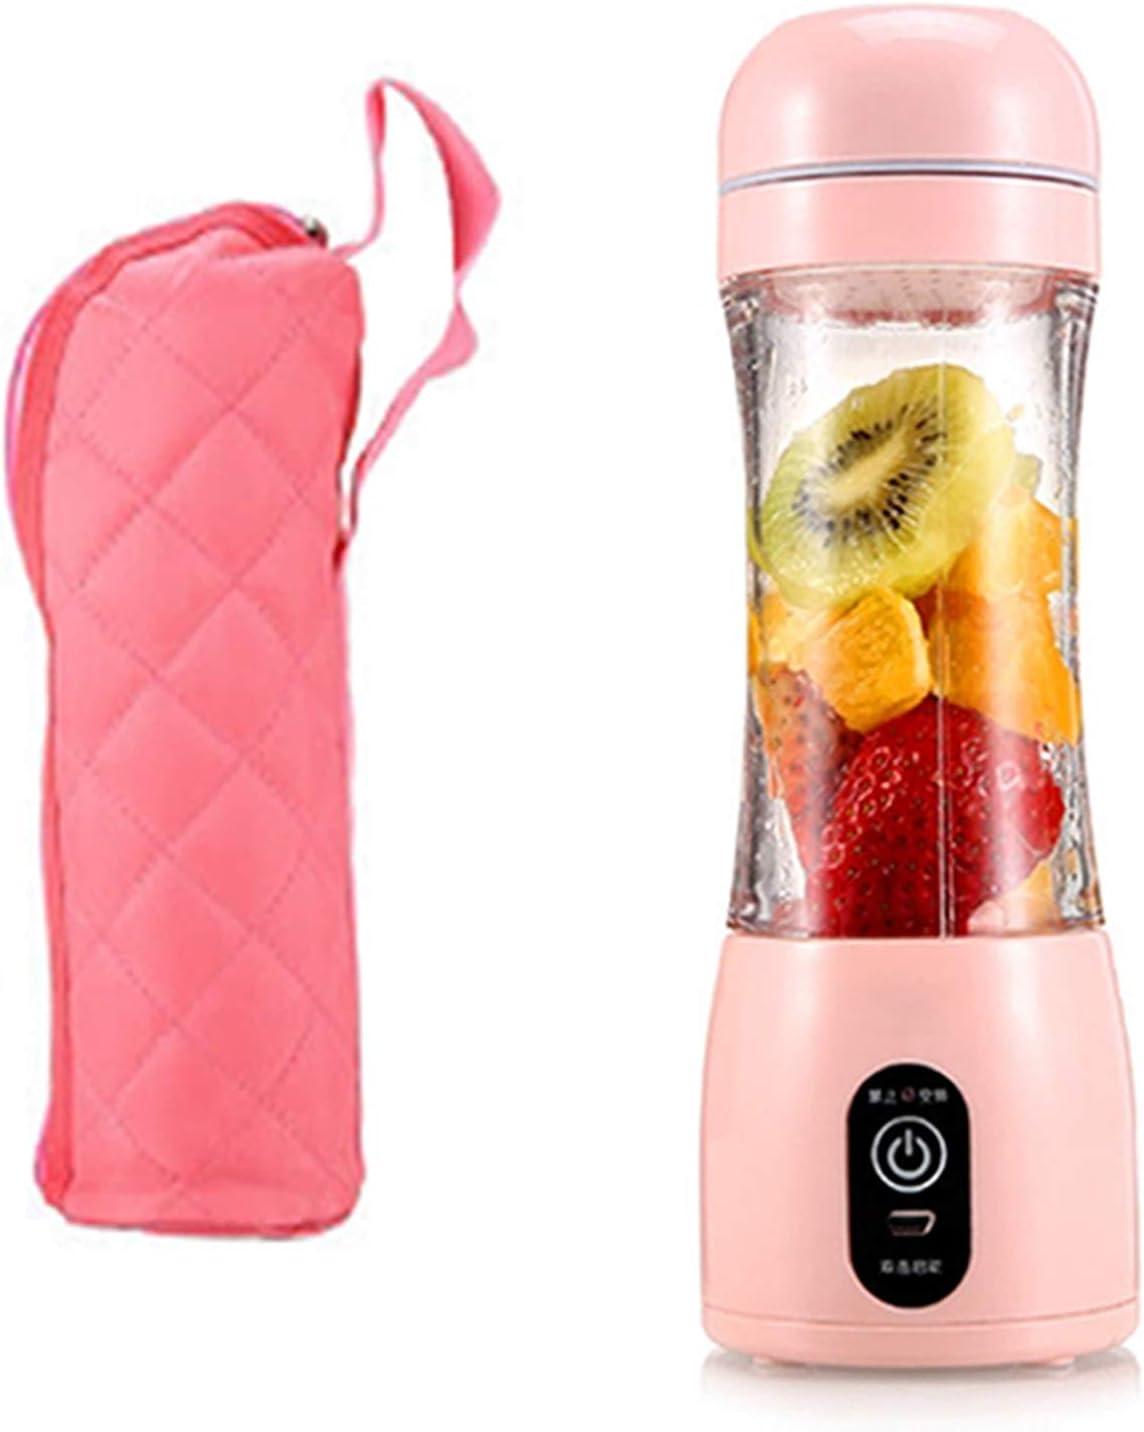 hyhy Portable Blender Personal Mixer Fruit Handhold Mini Travel Size Blender for Smoothie, Fruit Juice, Milk Shakes(Pink)